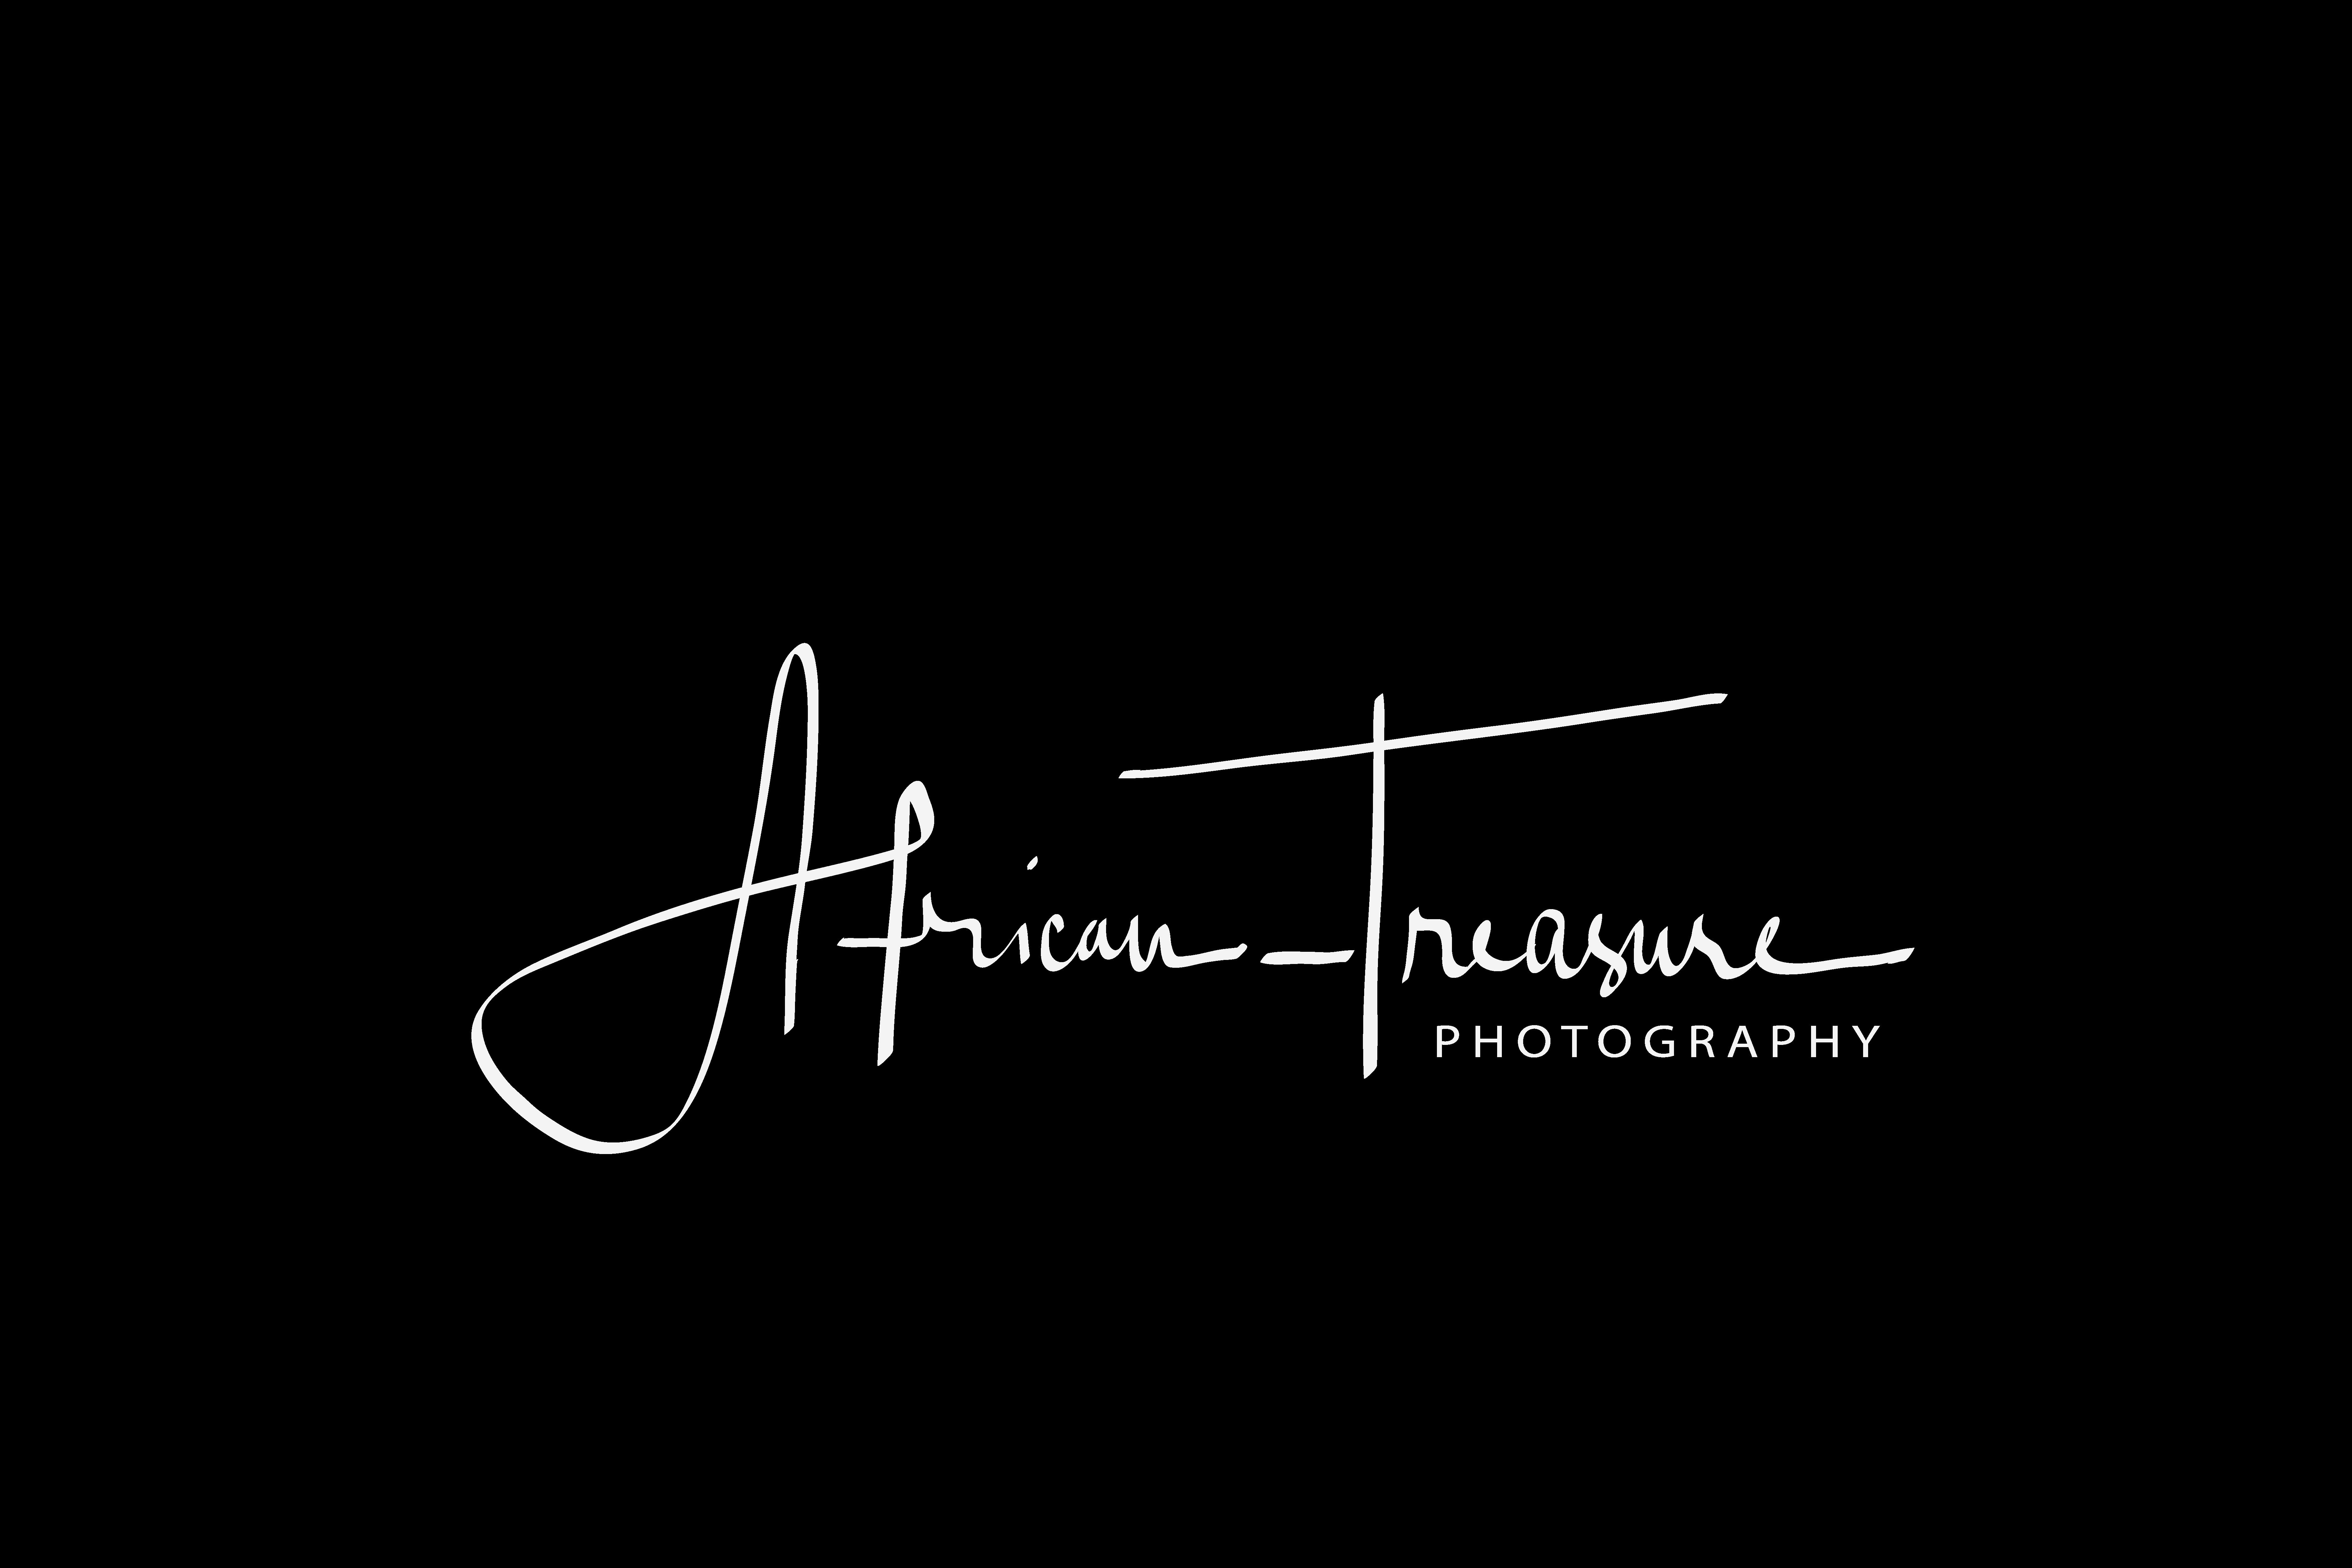 African_Treasure